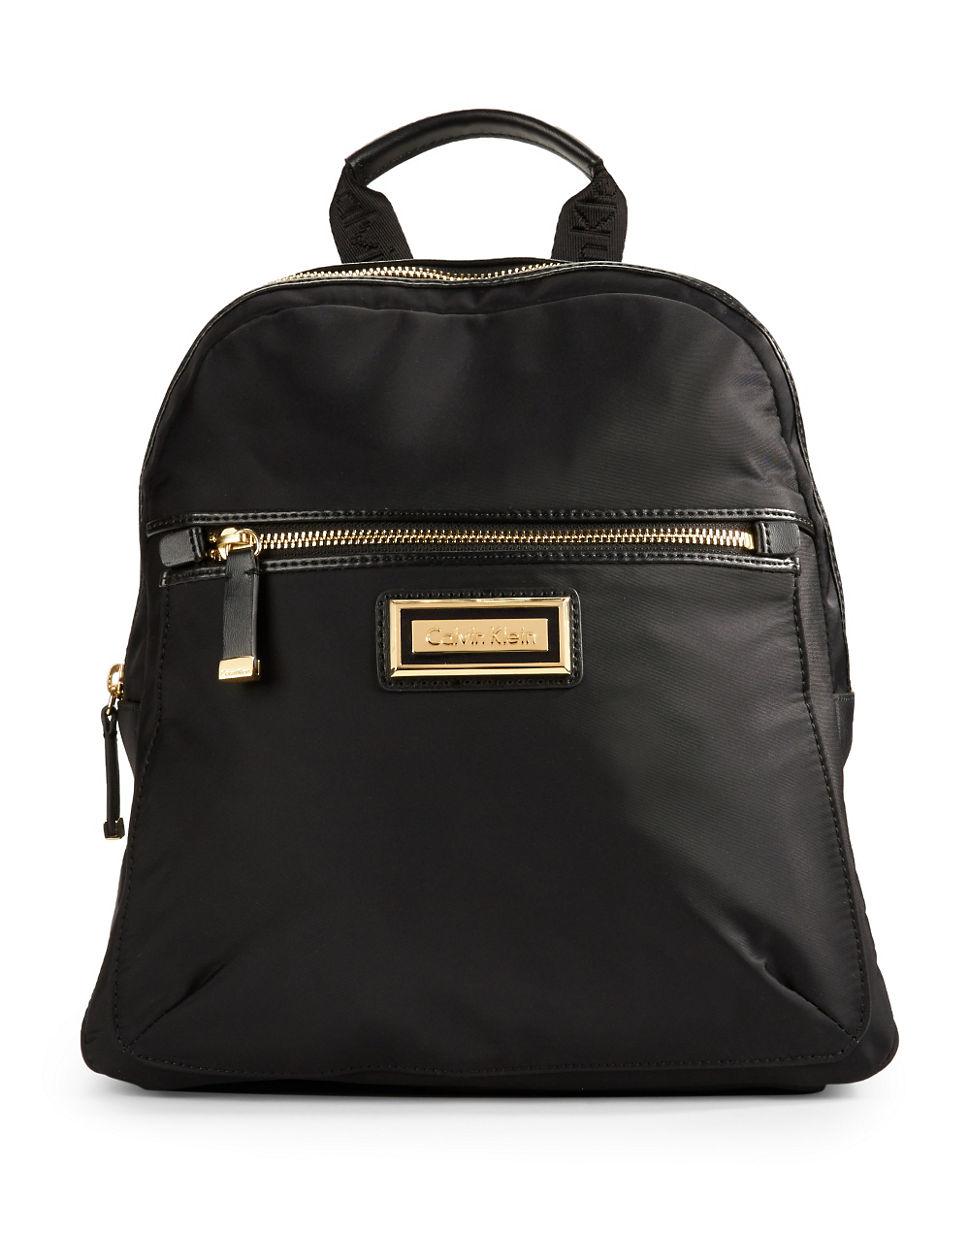 calvin klein smooth nylon backpack in black lyst. Black Bedroom Furniture Sets. Home Design Ideas